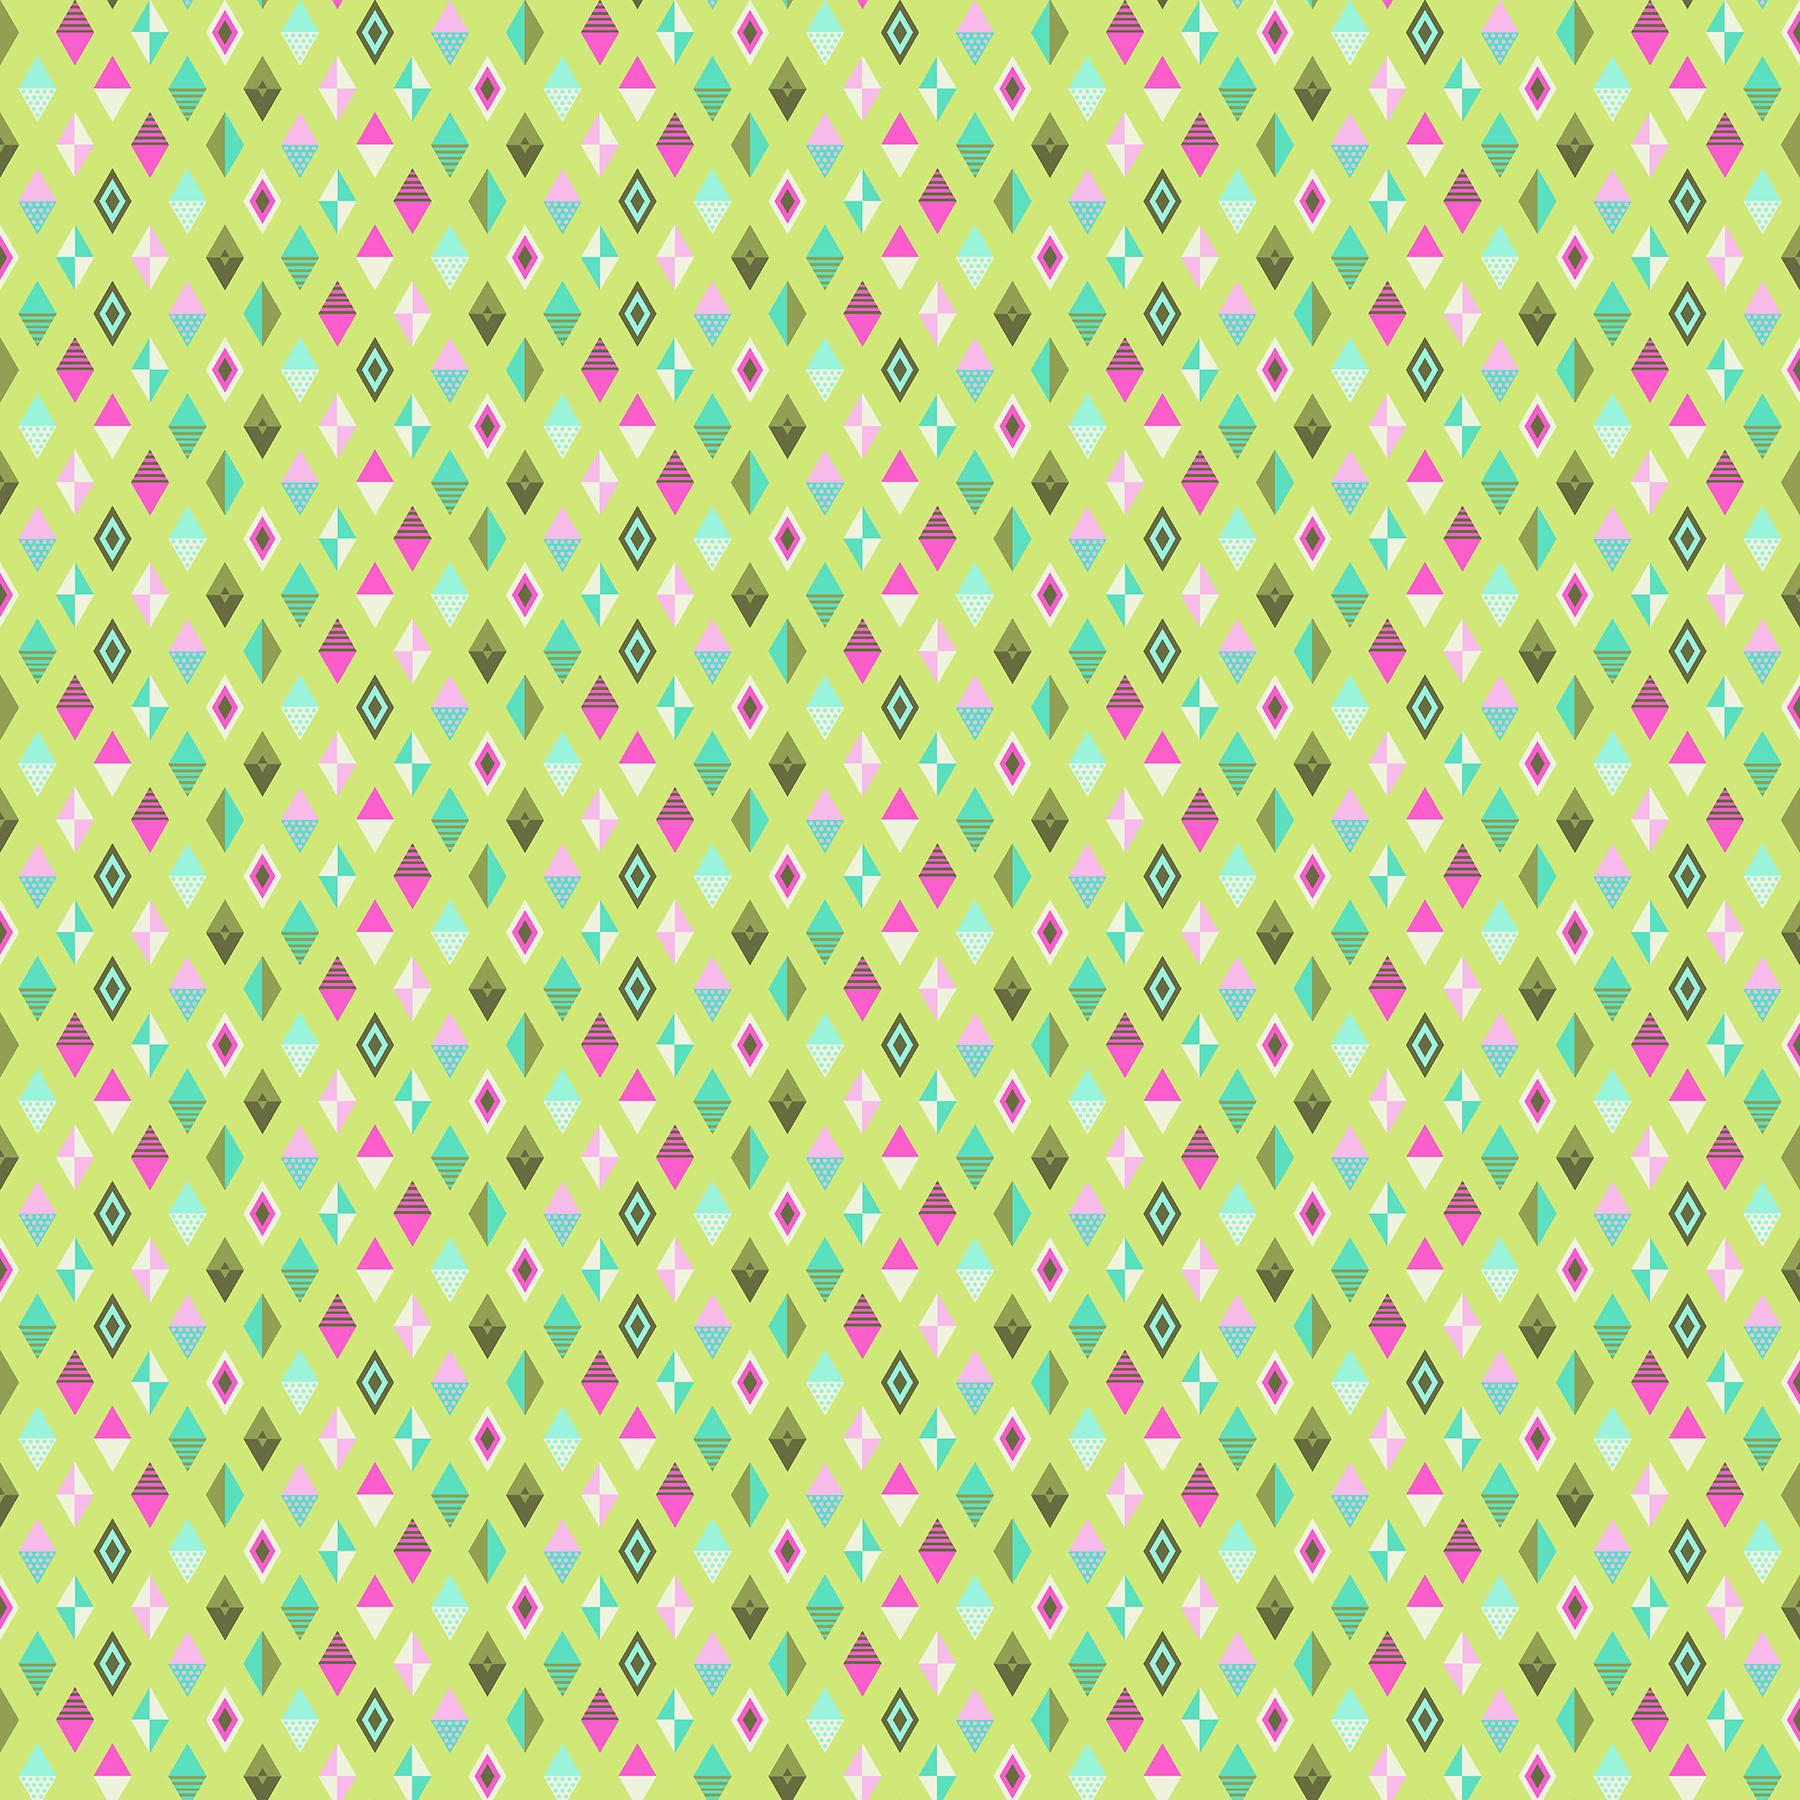 tula pink fabric slow steady track flags strawberry kiwi